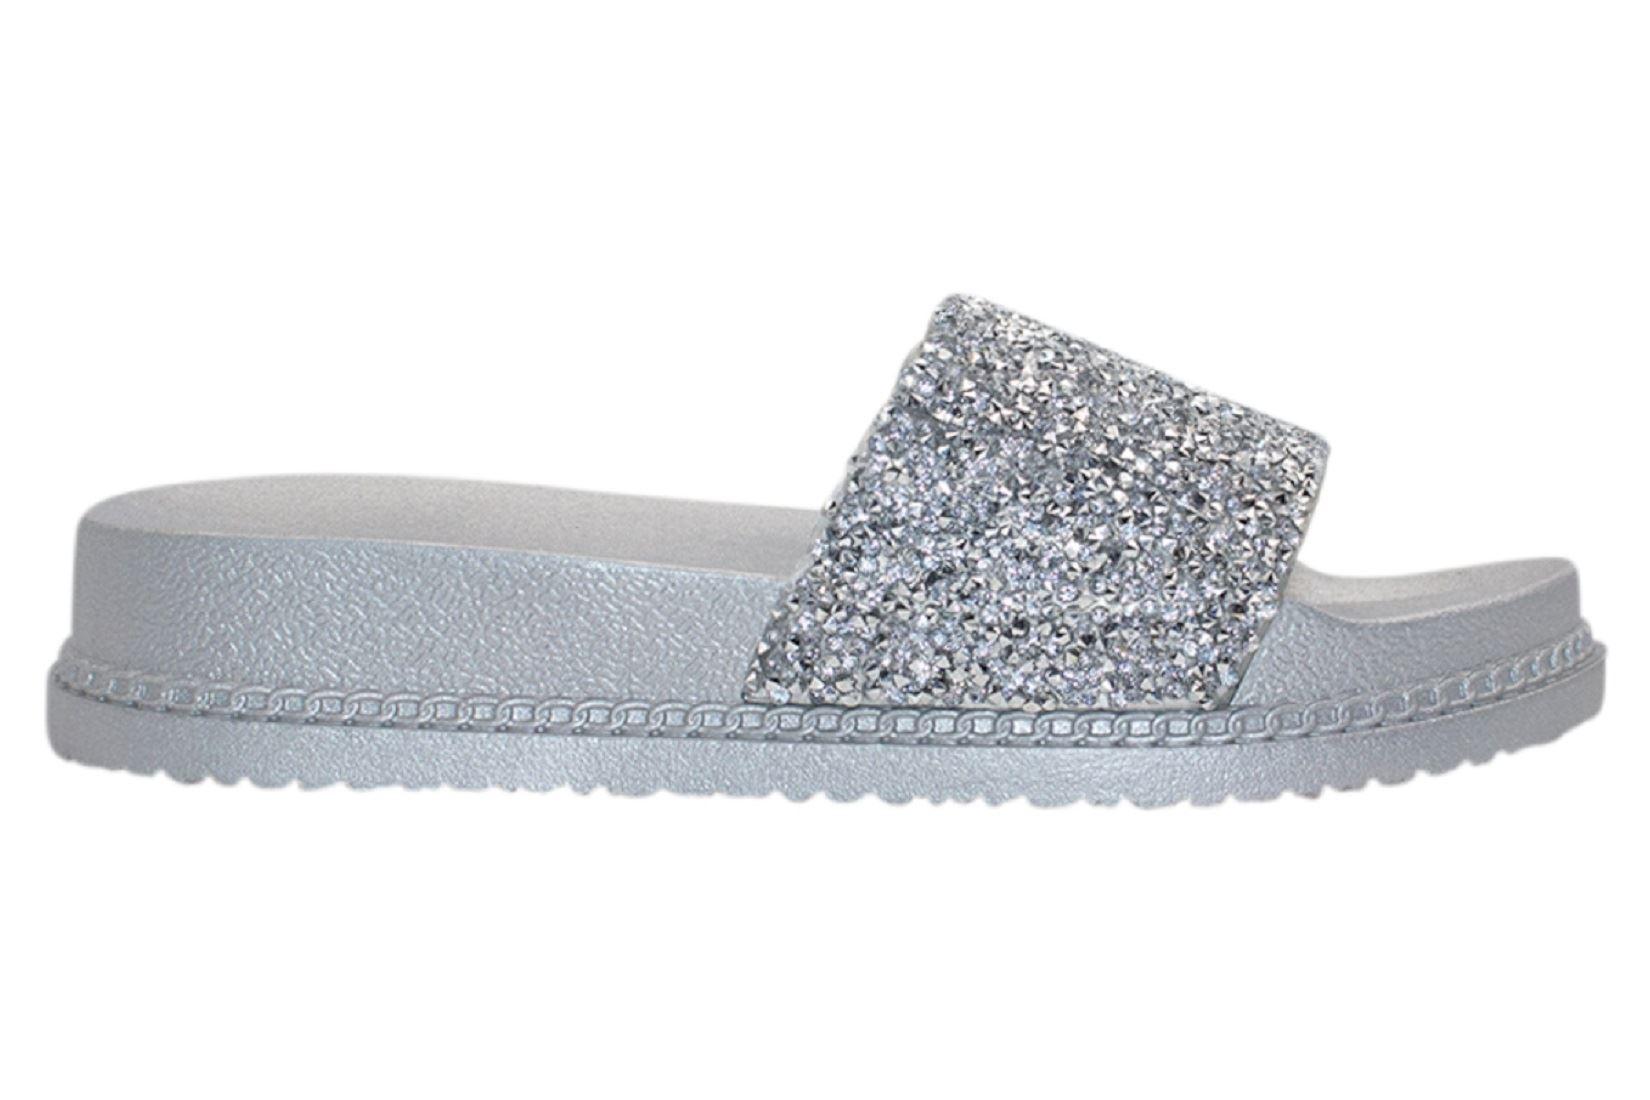 Womens-Sliders-Casual-Slippers-Mules-Ladies-Diamante-Flip-Flop-Sandals-Shoes thumbnail 62